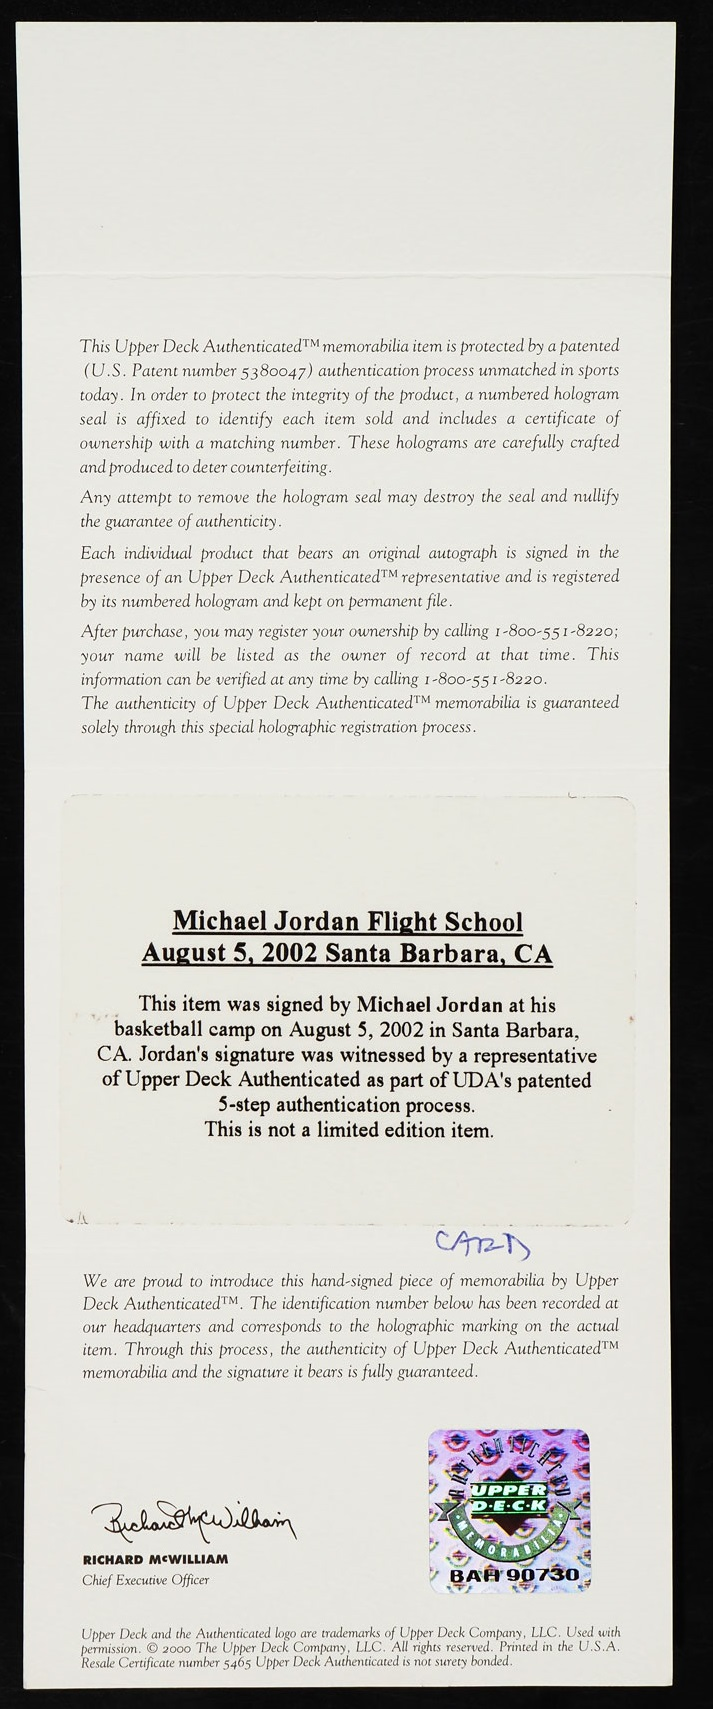 1997-98 Upper Deck Game Jersey Michael Jordan AUTO PATCH #GJ13, UDA COA - Image 3